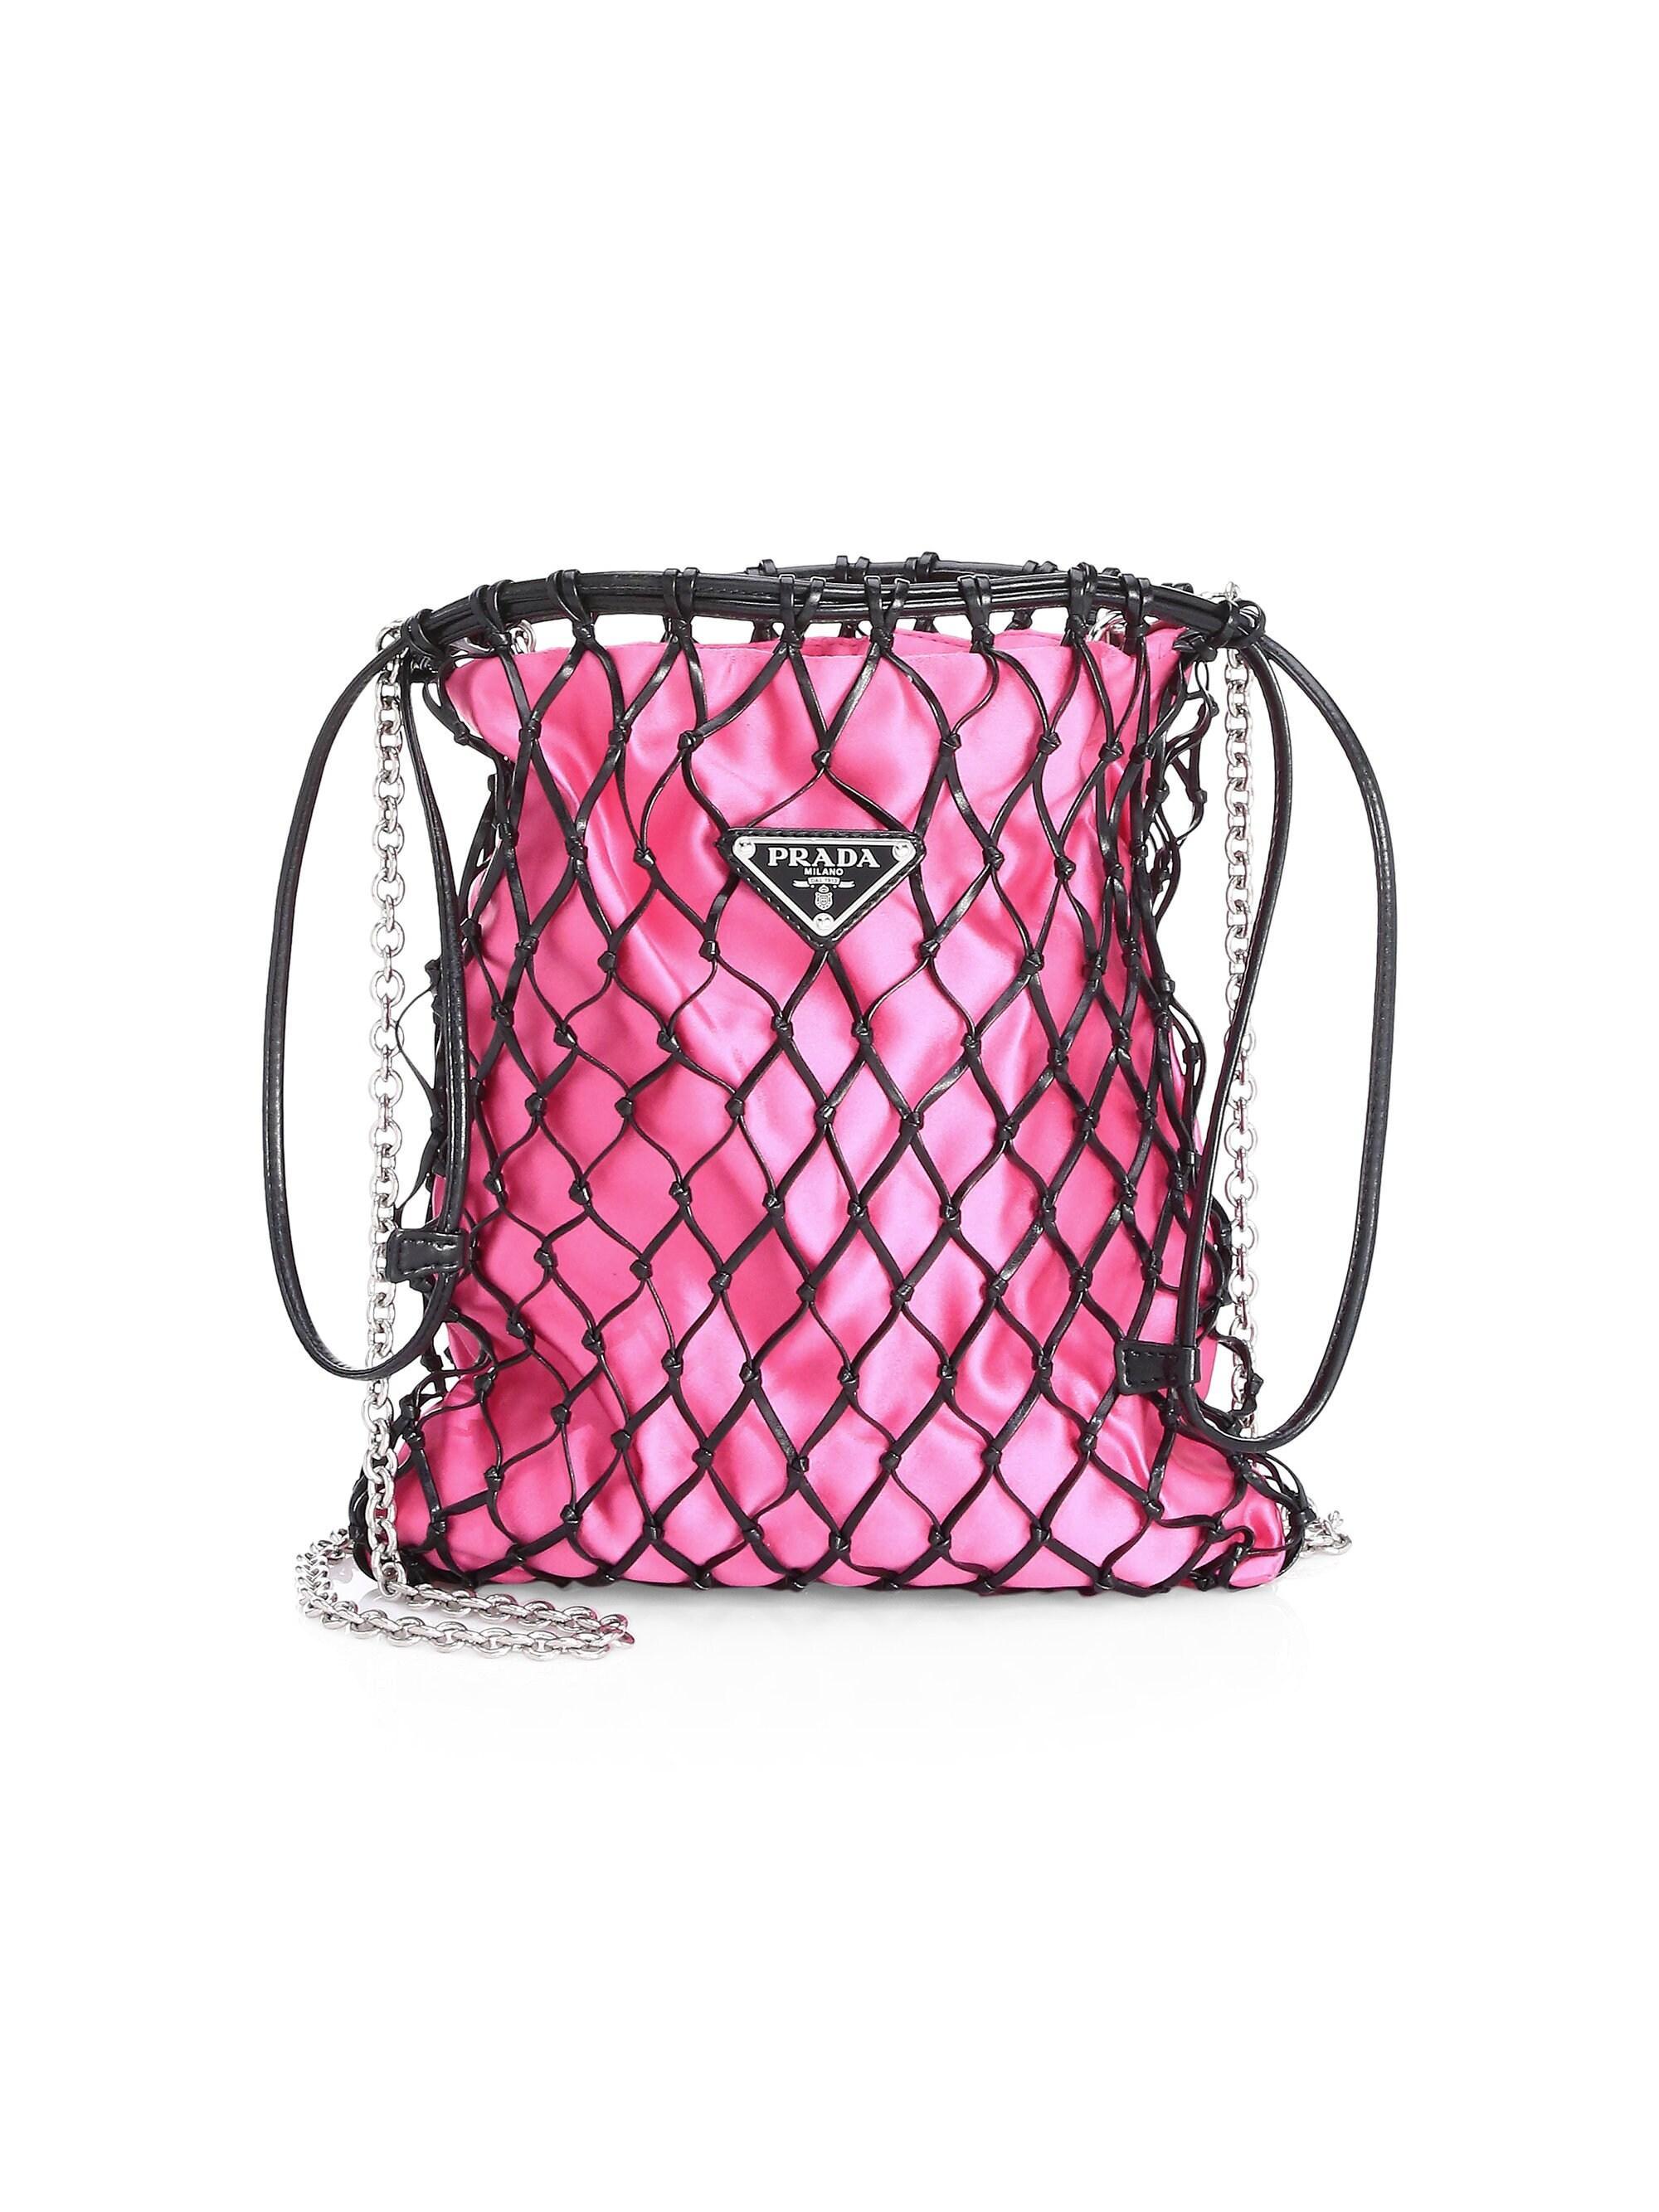 3d154e5a230f Prada. Pink Women's Silk Net Bag - Orange. Track. $895. From Saks Fifth  Avenue